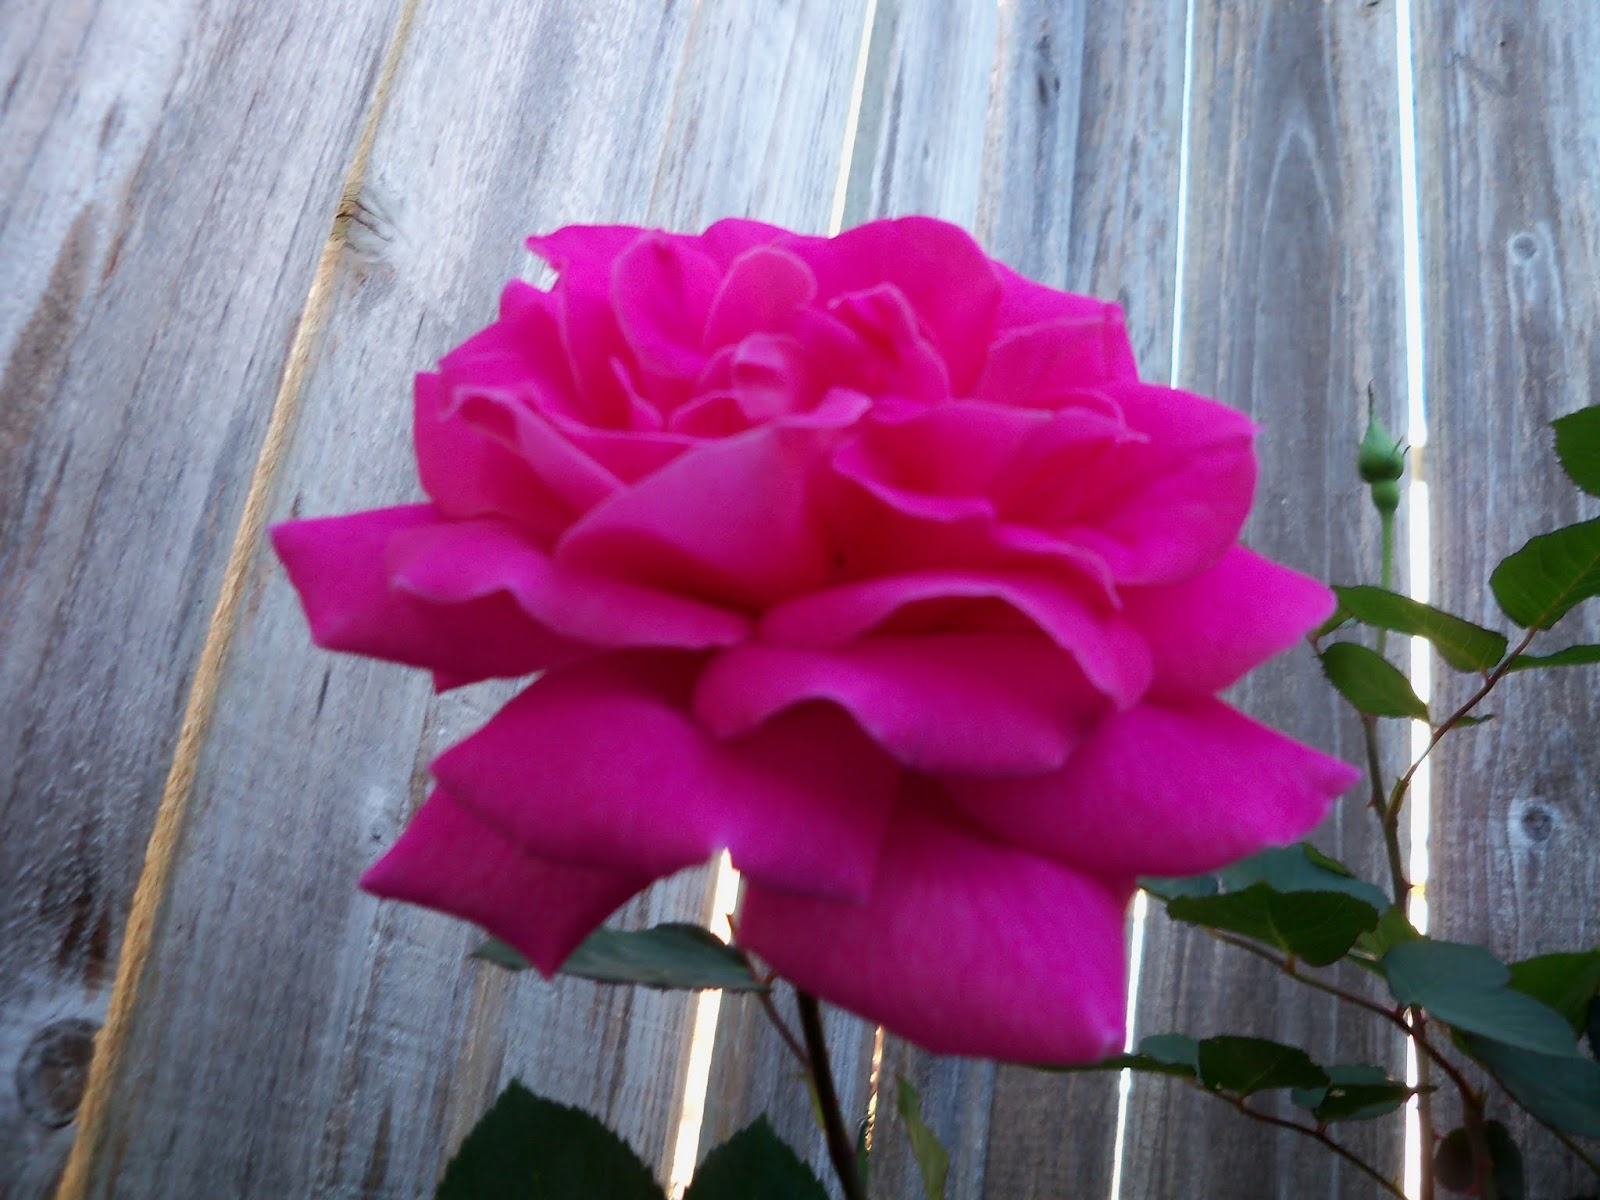 Gardening 2013 - 115_5393.JPG